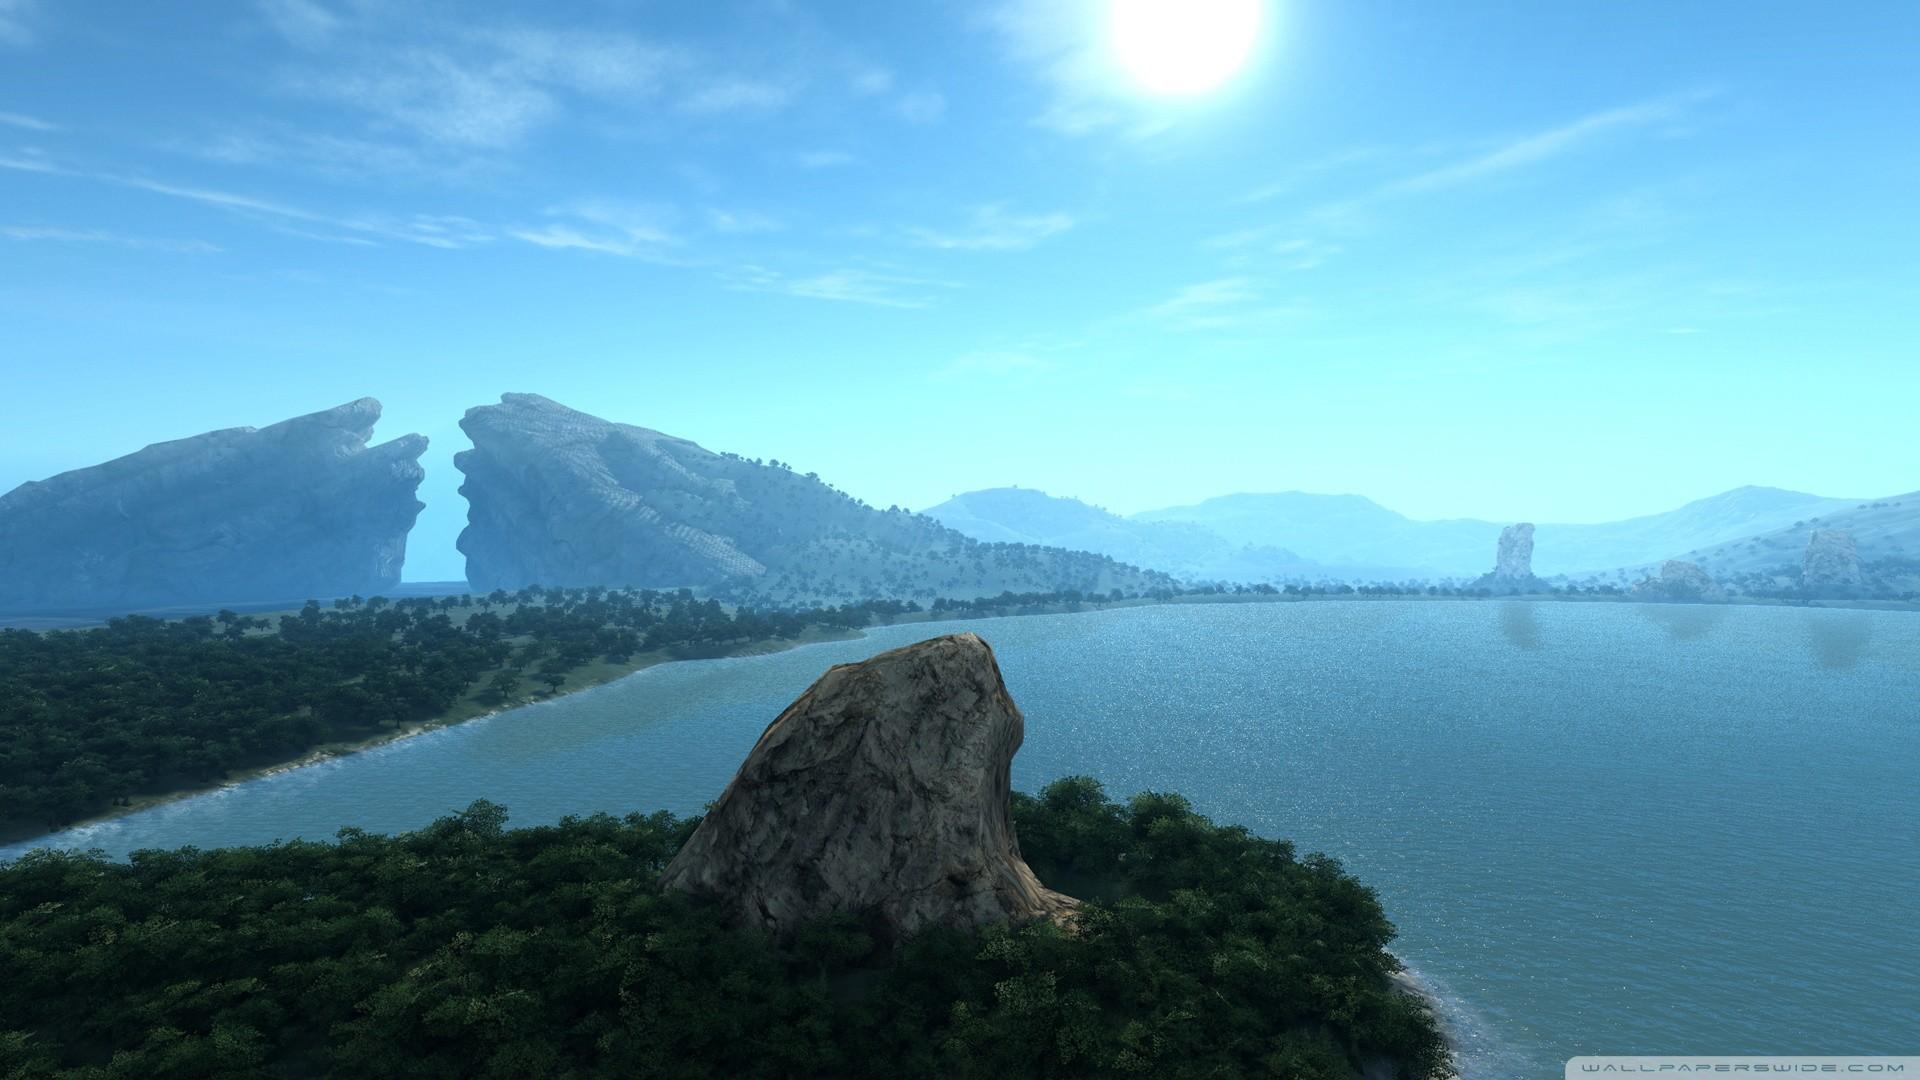 … final fantasy xiv online screenshot hd desktop wallpaper; ffxiv wallpaper  1080p wallpapersafari …